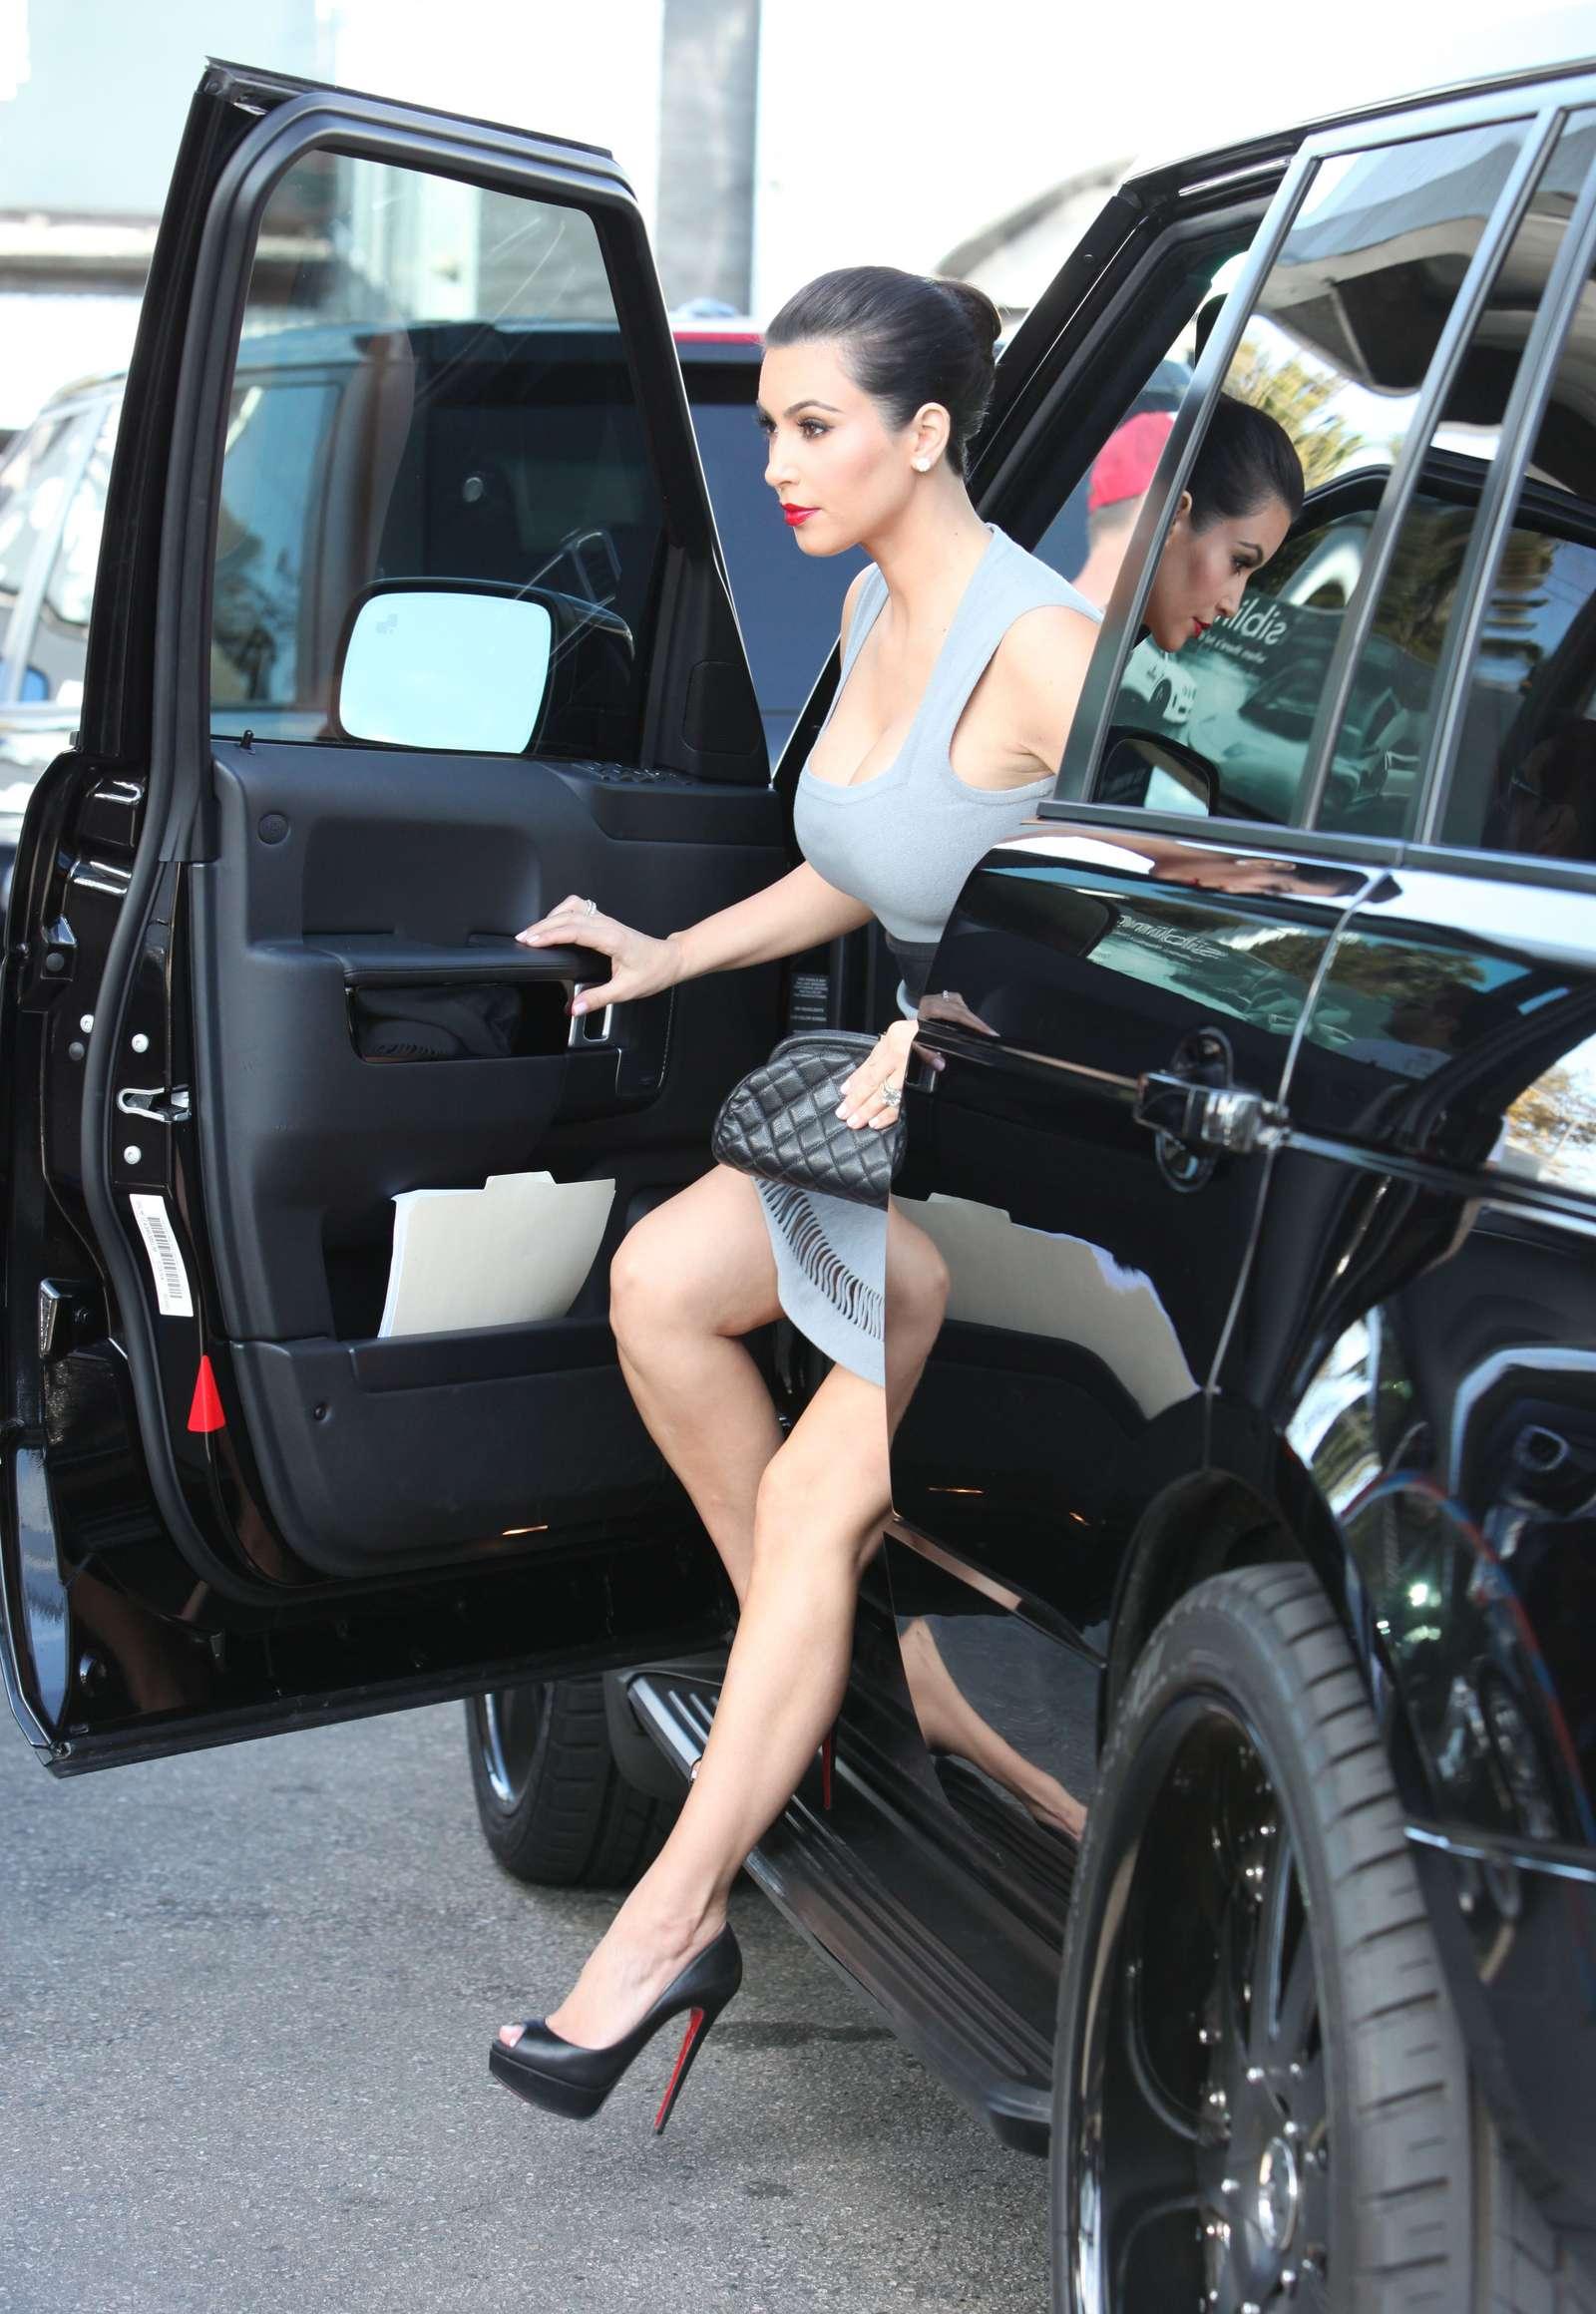 Kim Kardashian Car Dealership Beverly Hills Oct 4th 2011